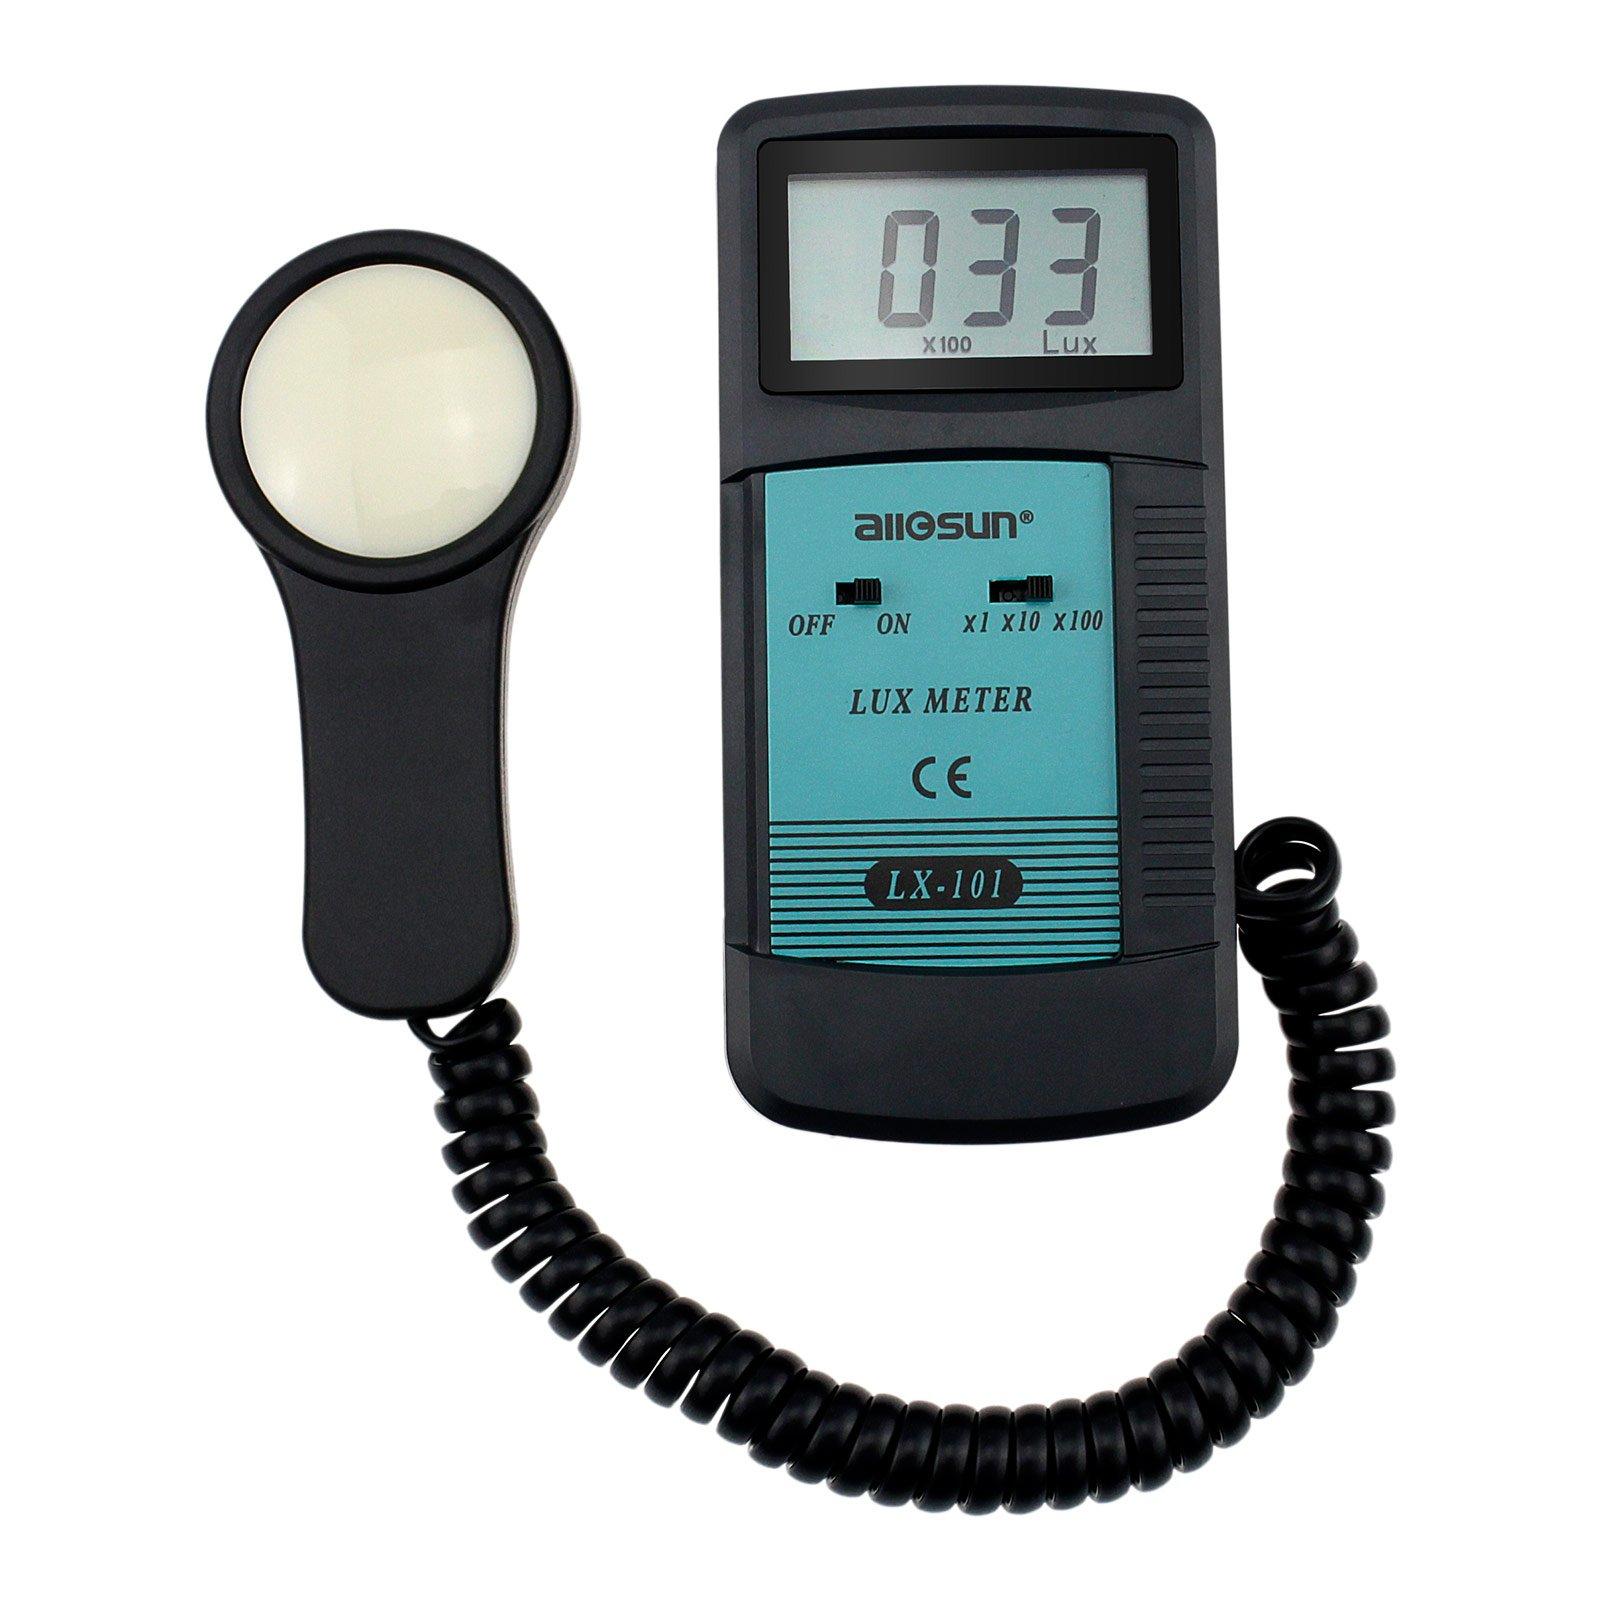 all-sun Digital Lux Meter Light Meter Photometer